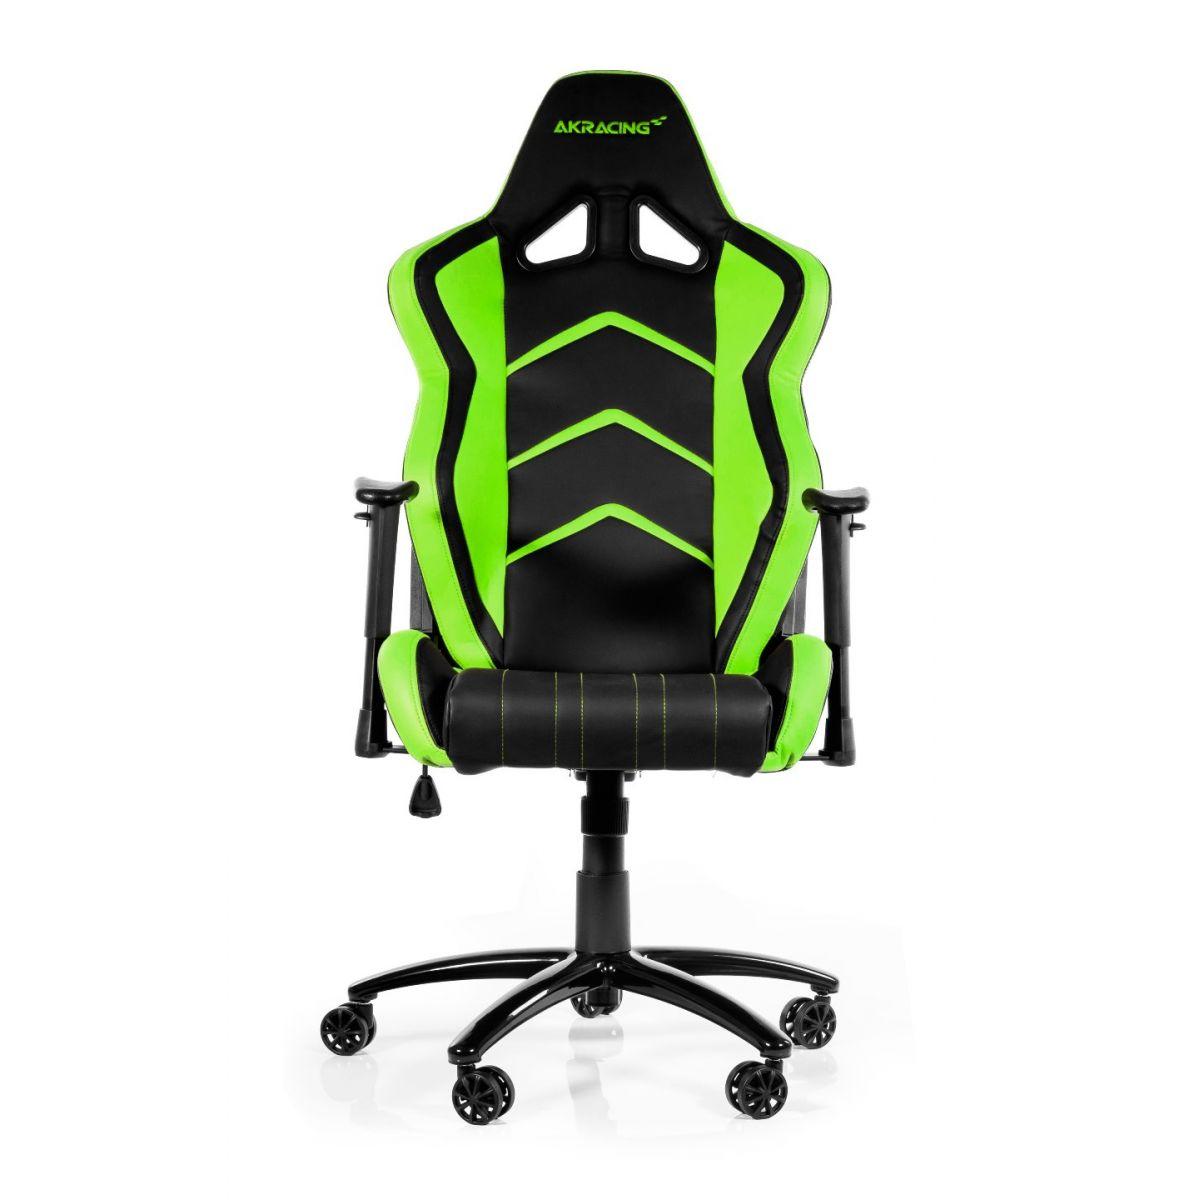 Cadeira AKRacing Player Gaming Black/Green AK-K6014-BG - AKRacing